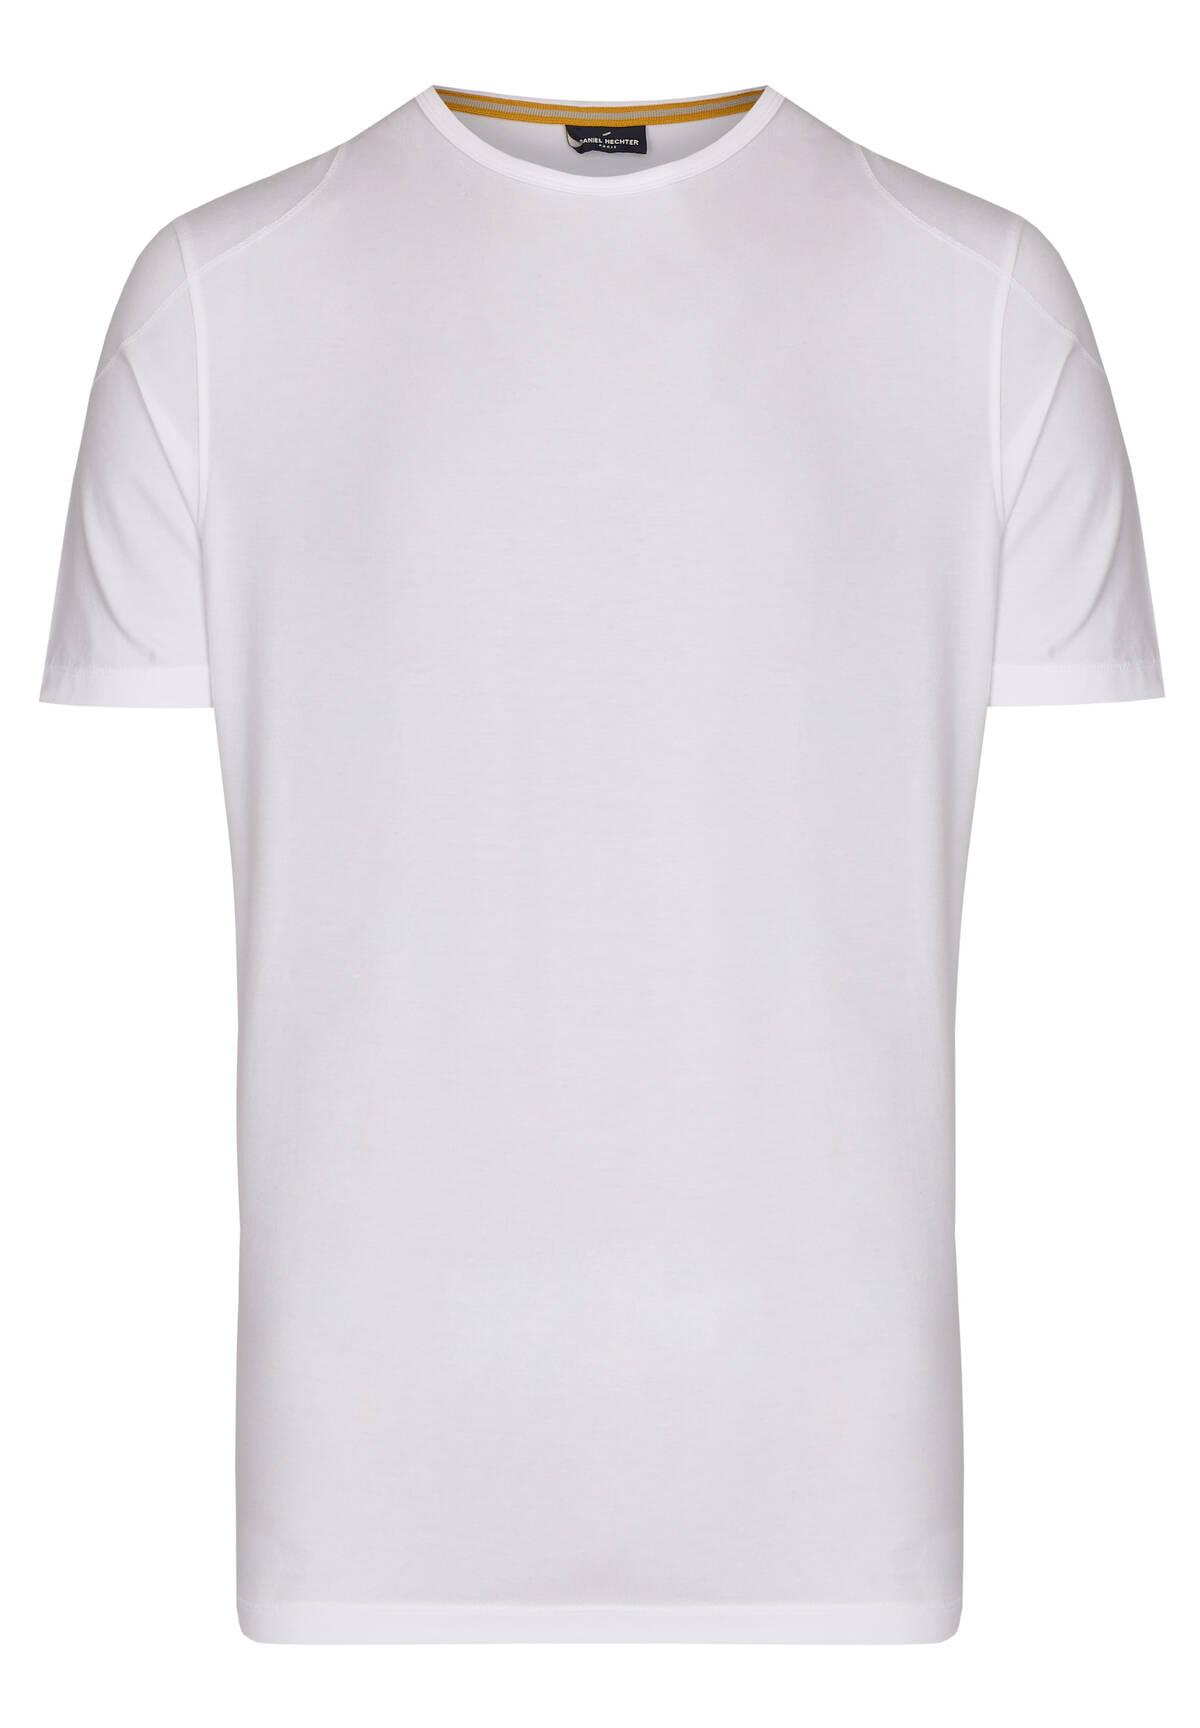 DH-ECO Nachhaltiges T-Shirt / T-SHIRT